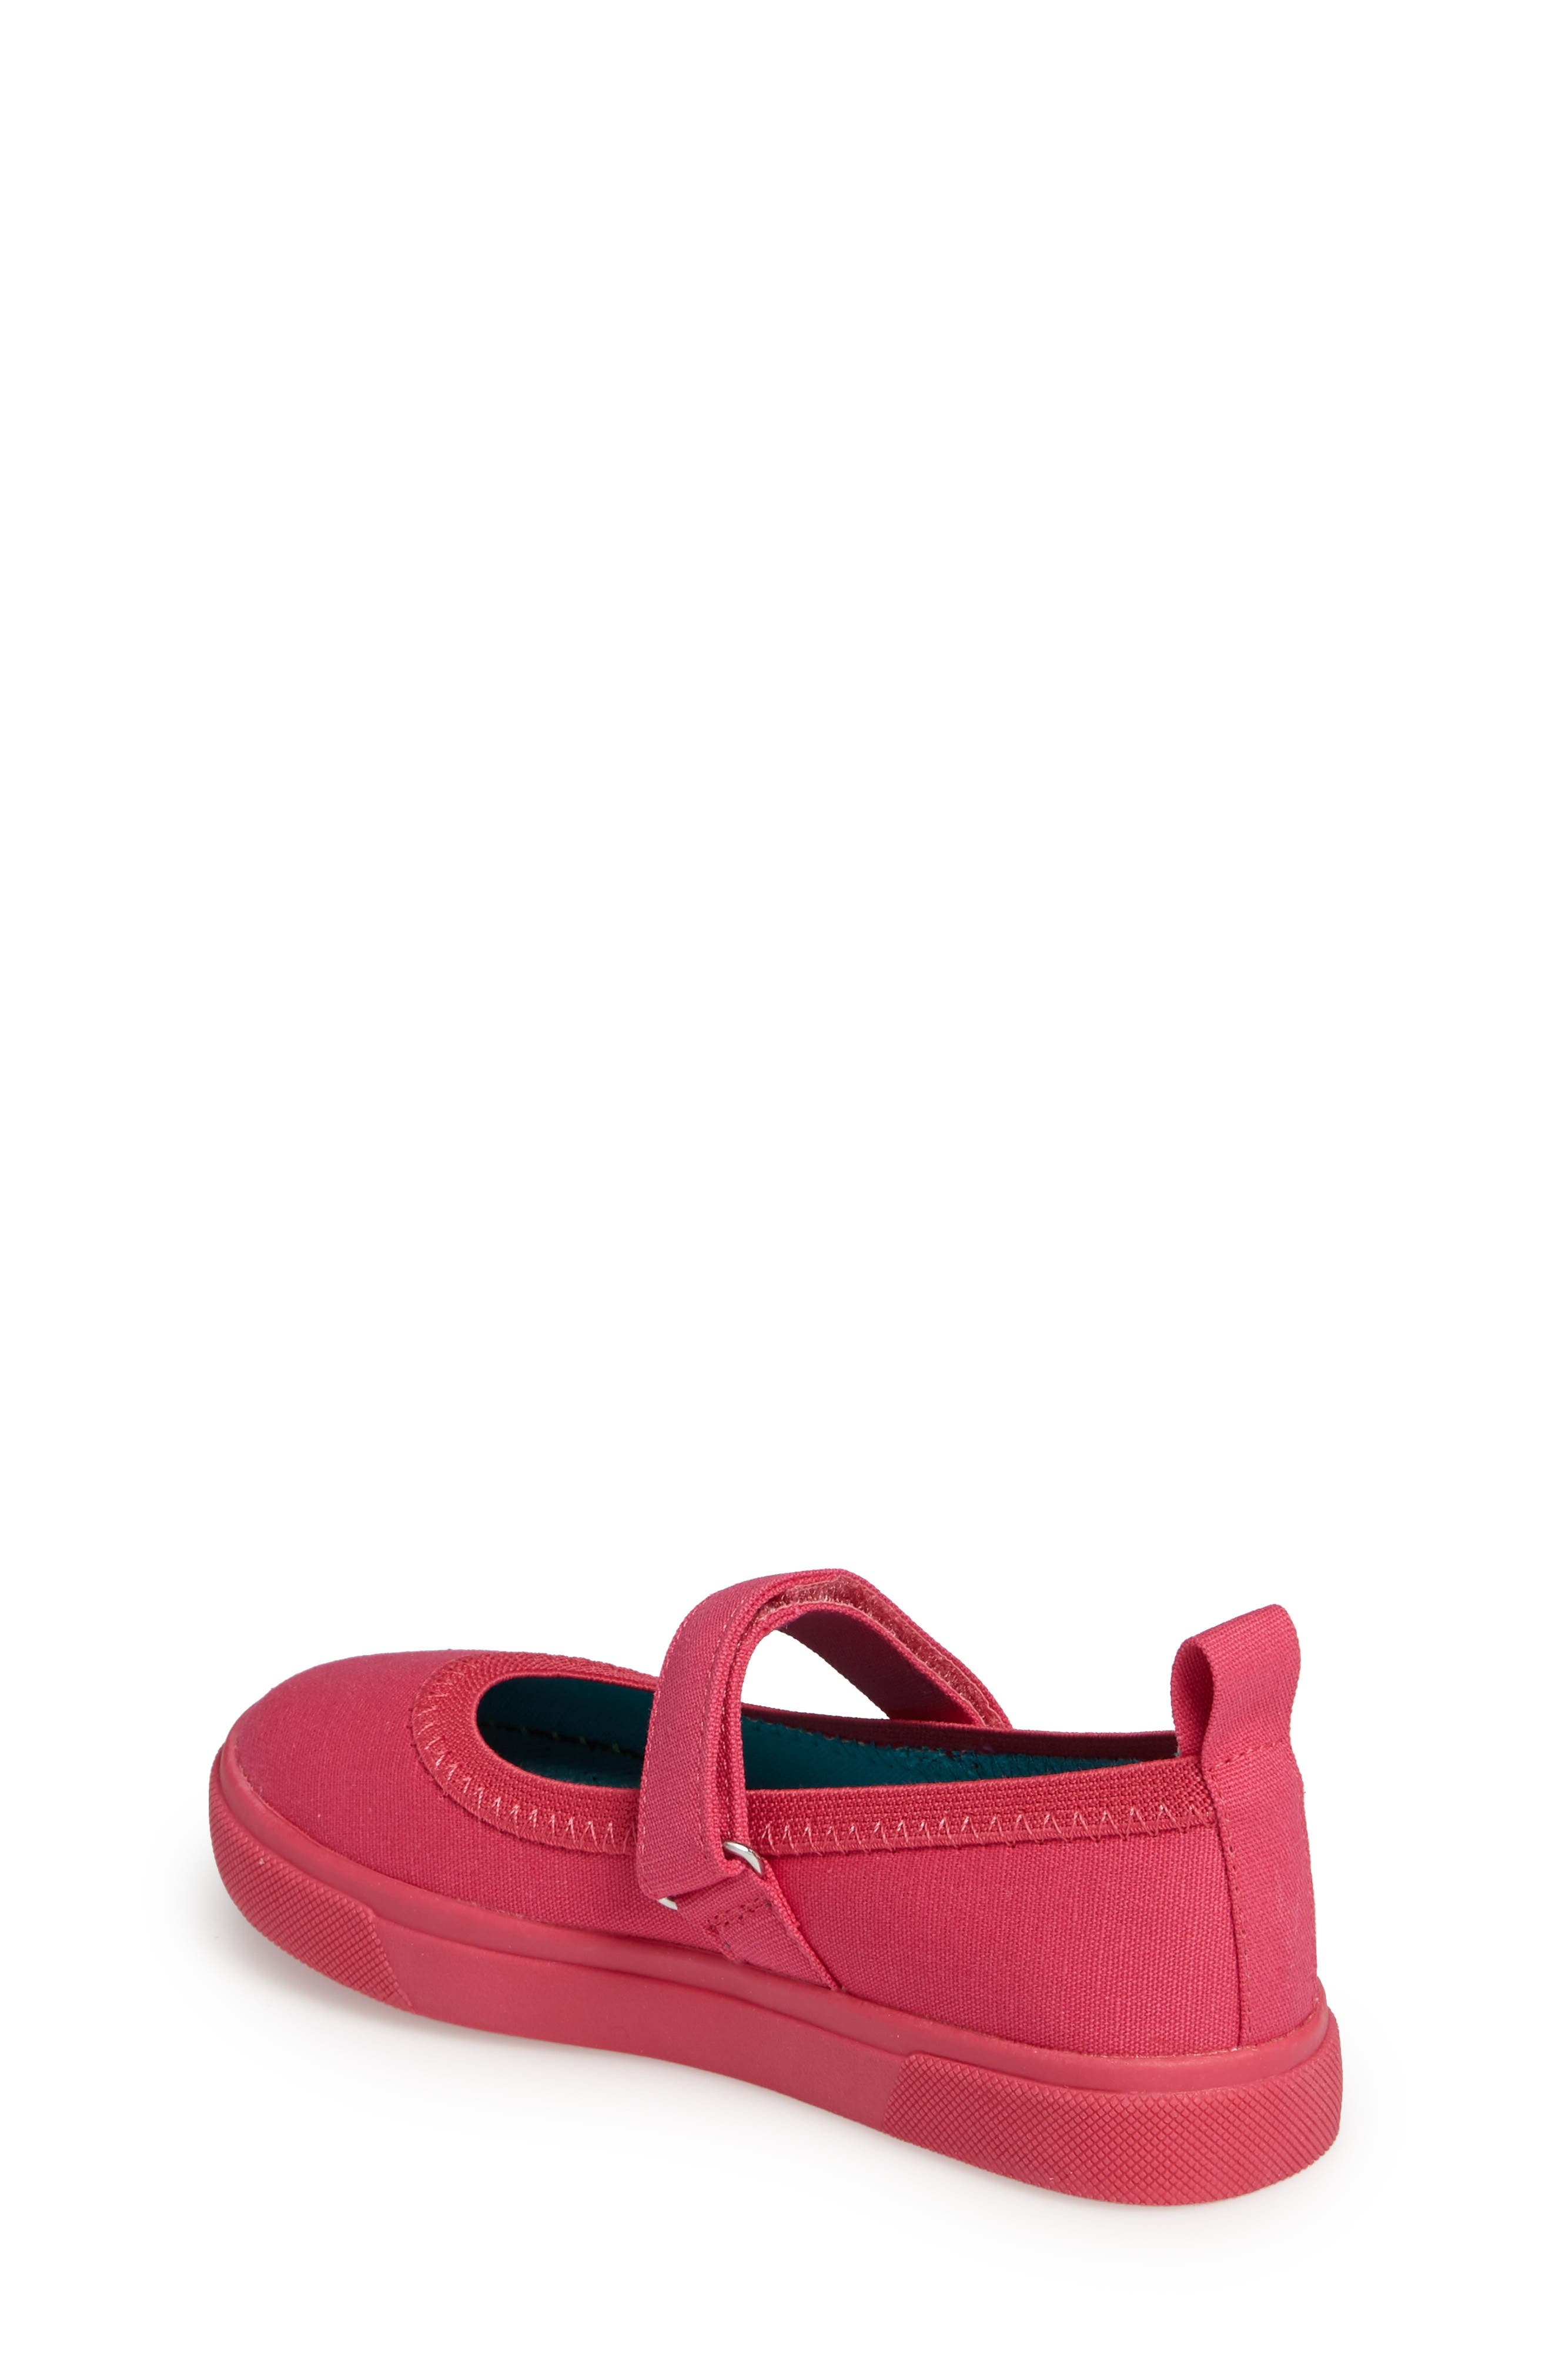 Skip Mary Jane Sneaker,                             Alternate thumbnail 2, color,                             Prism